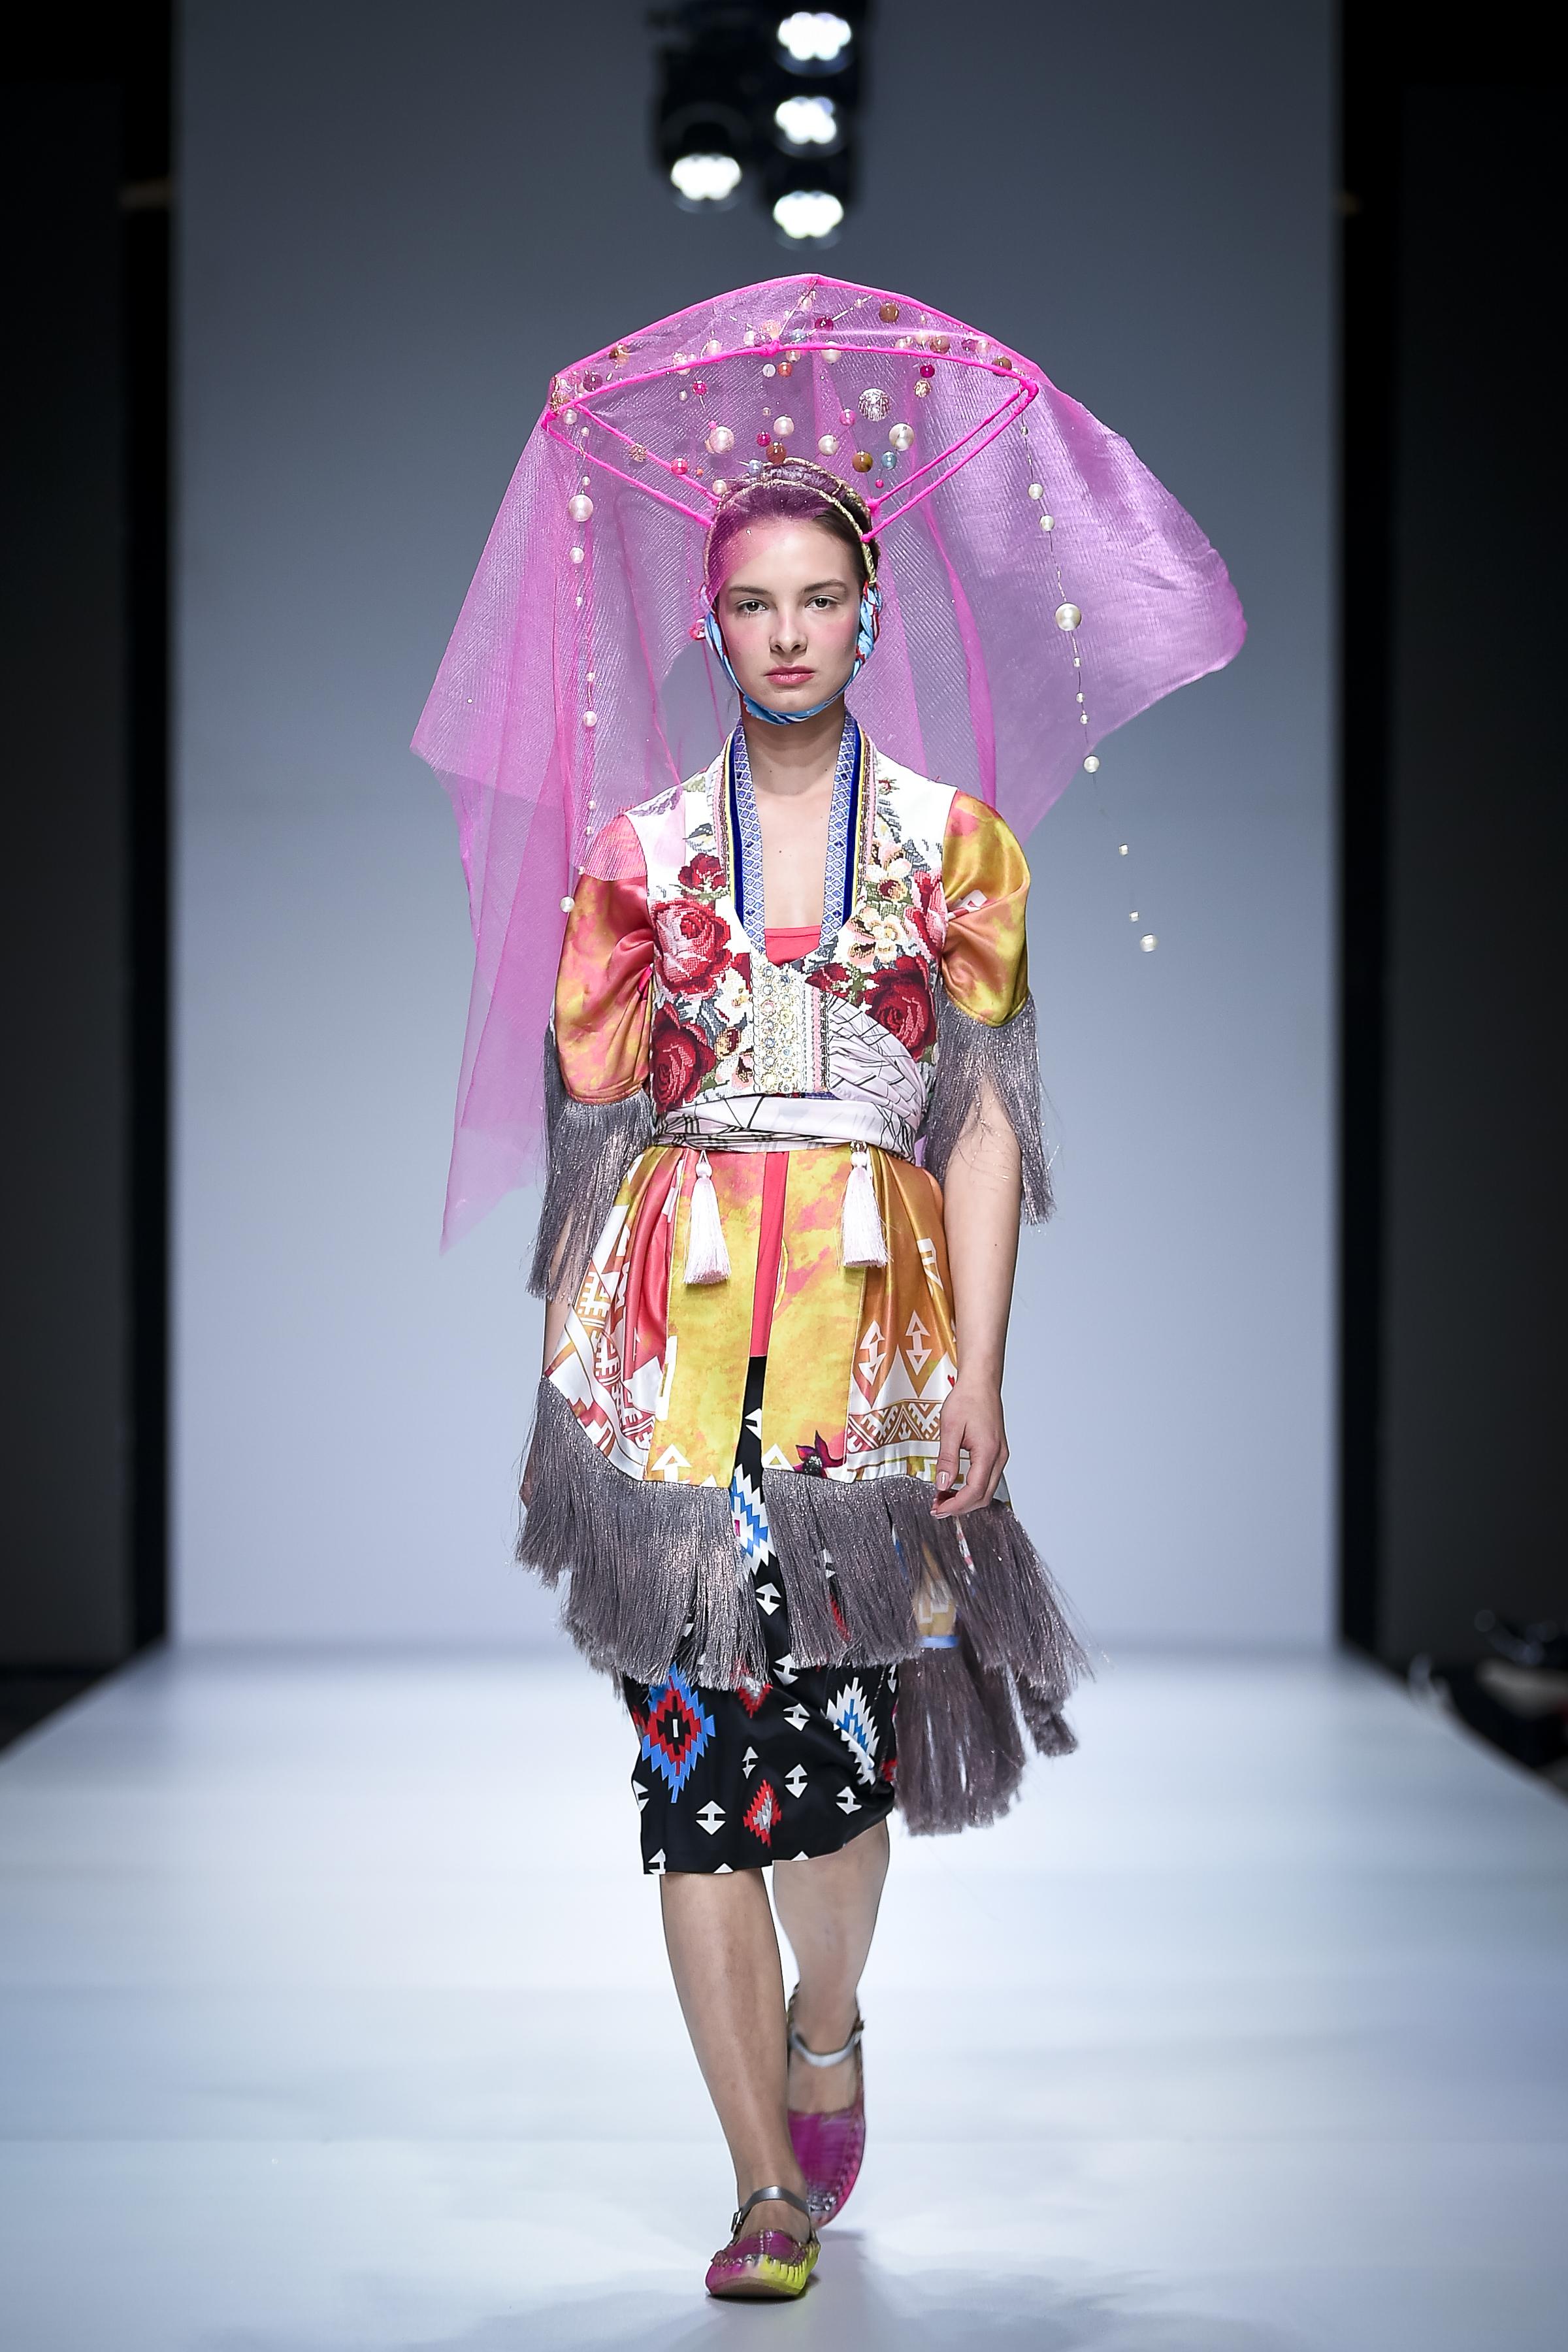 LJFW apr19 Day1 photoJureMakovec 207 Gala Borović pobednica Fashion Scout SEE konkursa